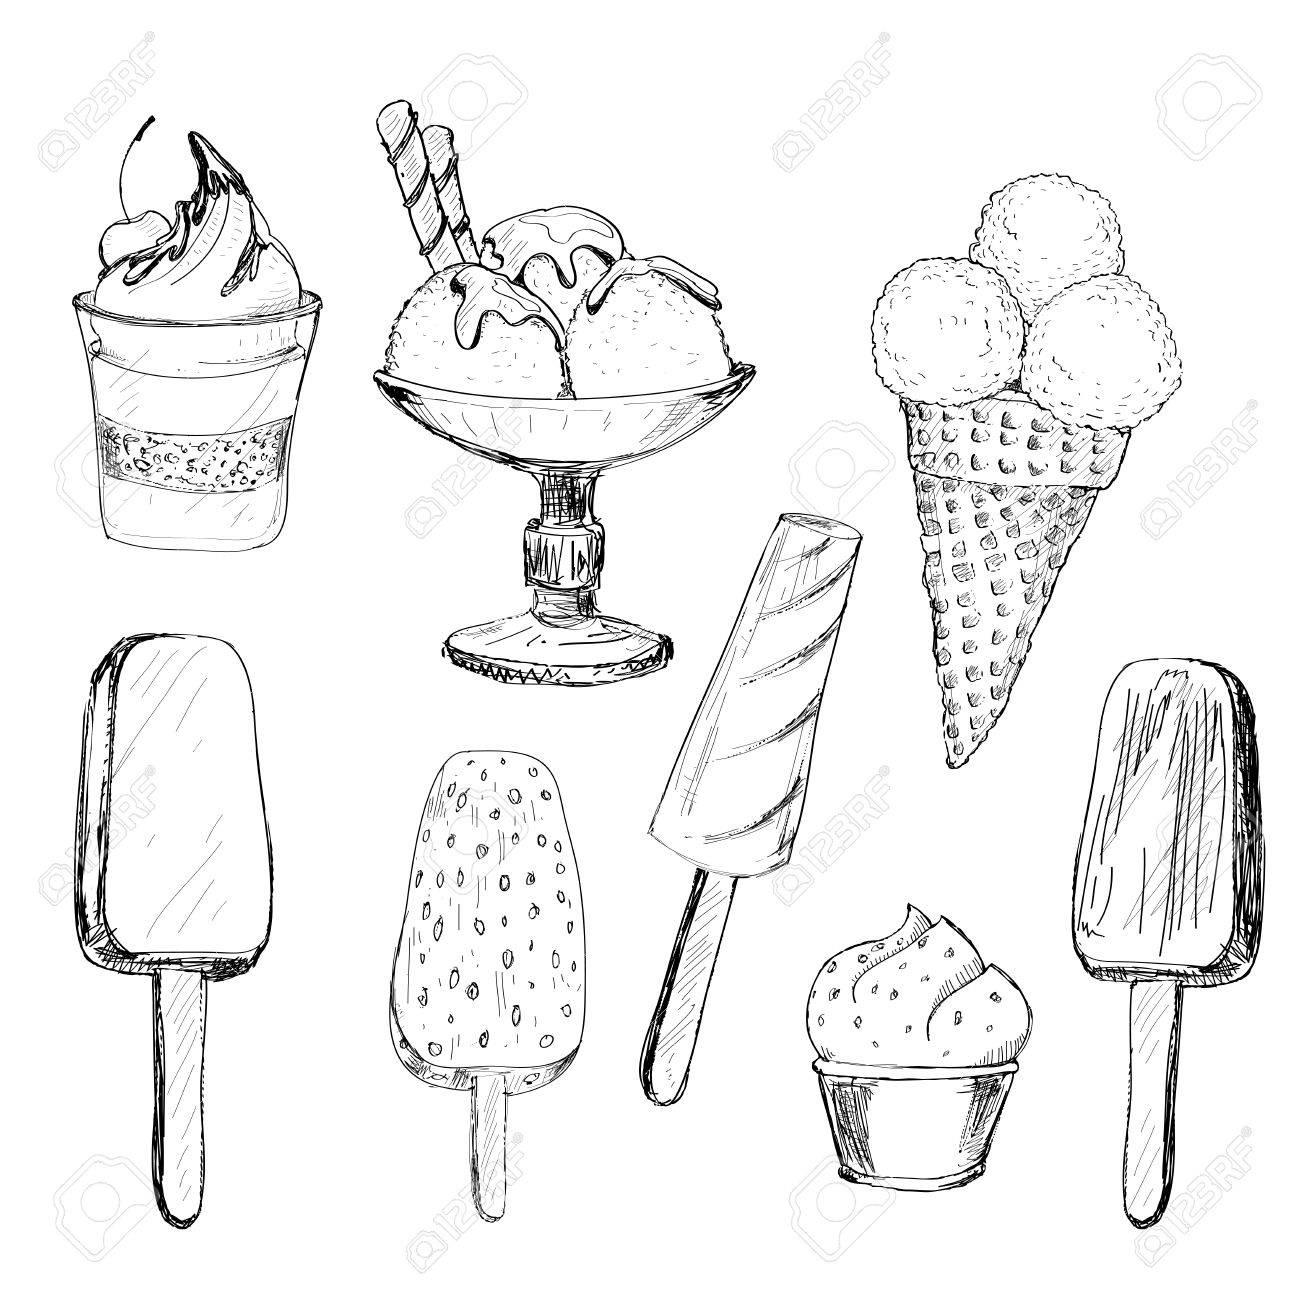 1300x1300 Ice Cream. Set Of Graphic Hand Drawn Illustrations Royalty Free